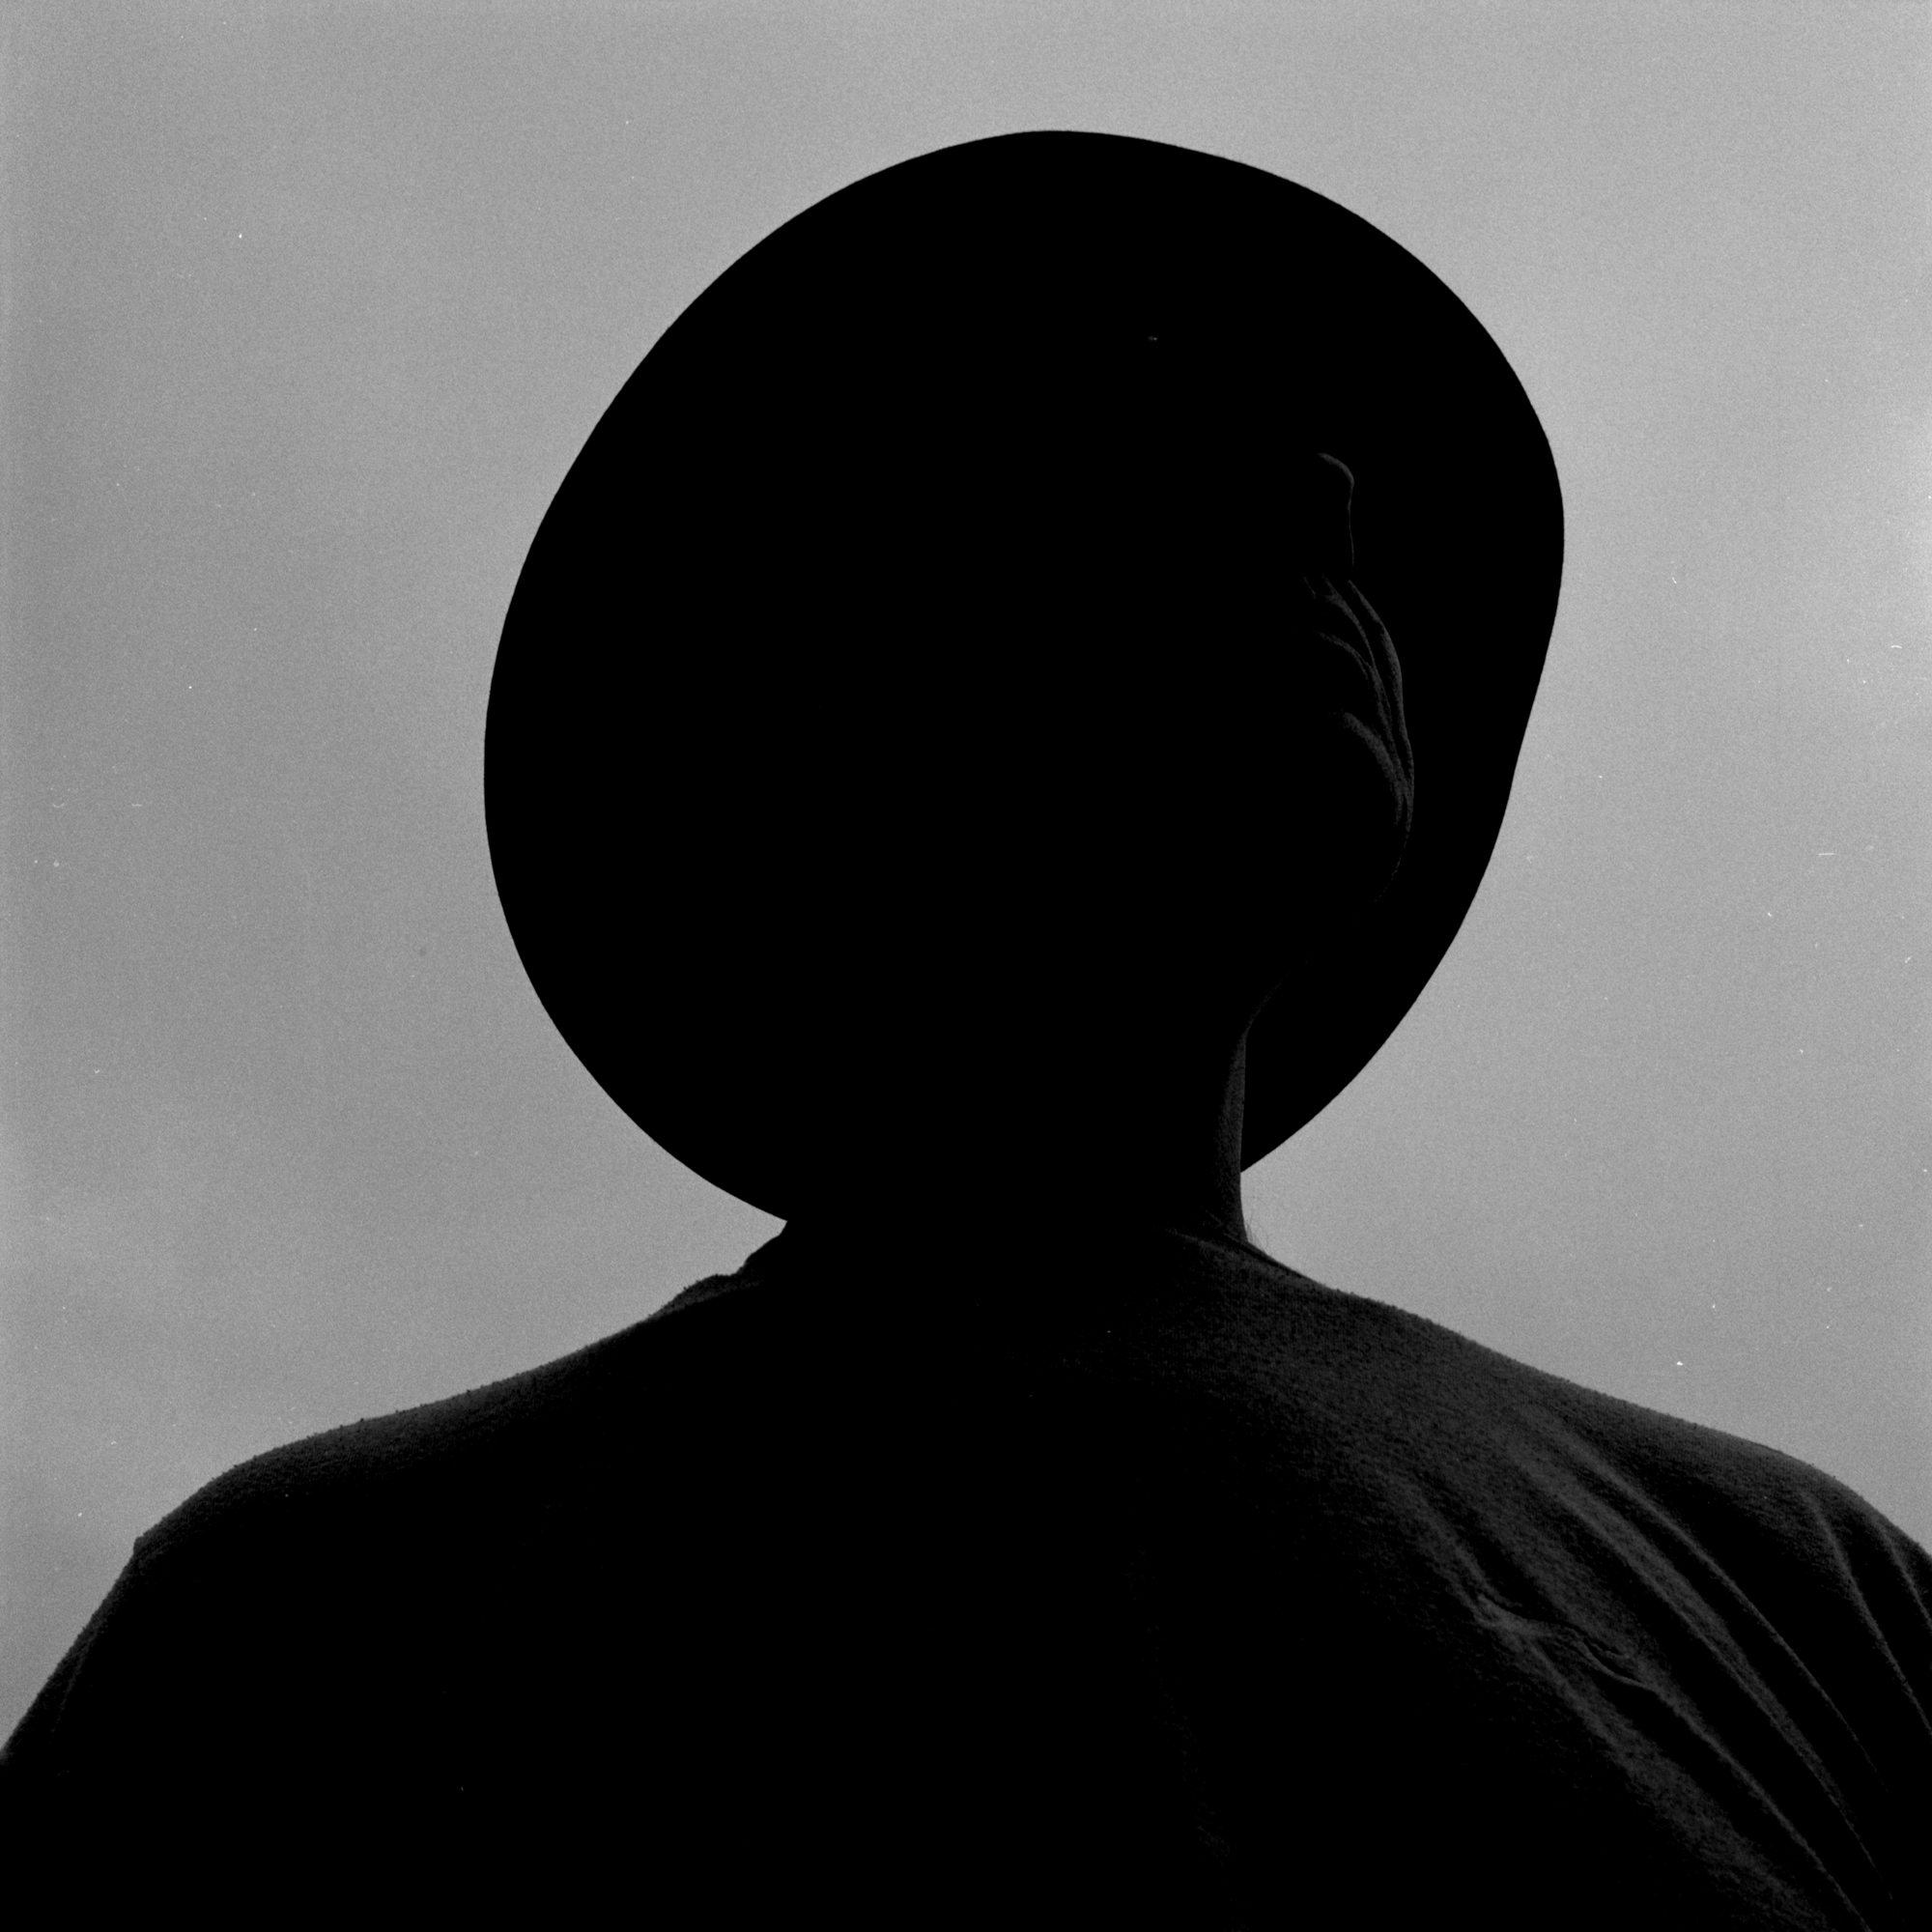 Tavis Amosford - 20x20 Framed Silhouette Print